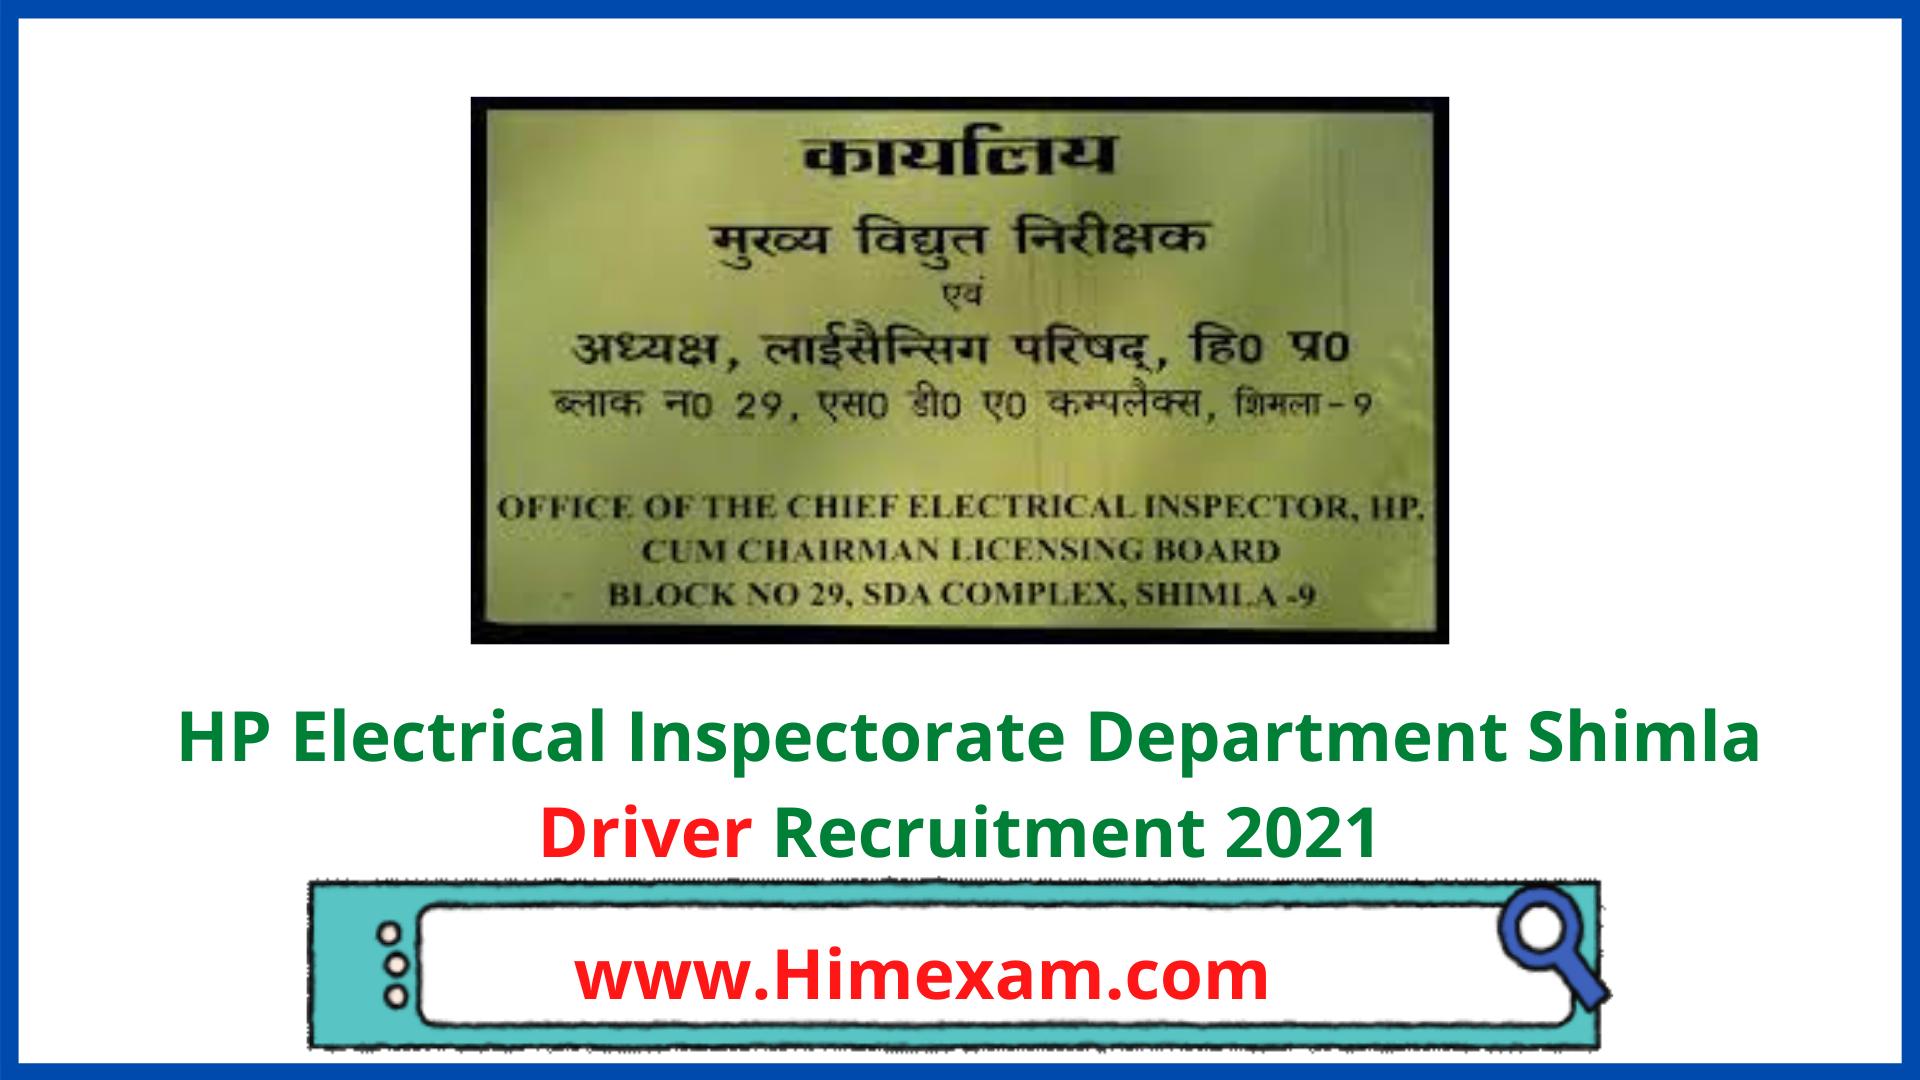 HP Electrical Inspectorate Department Shimla Driver Recruitment 2021